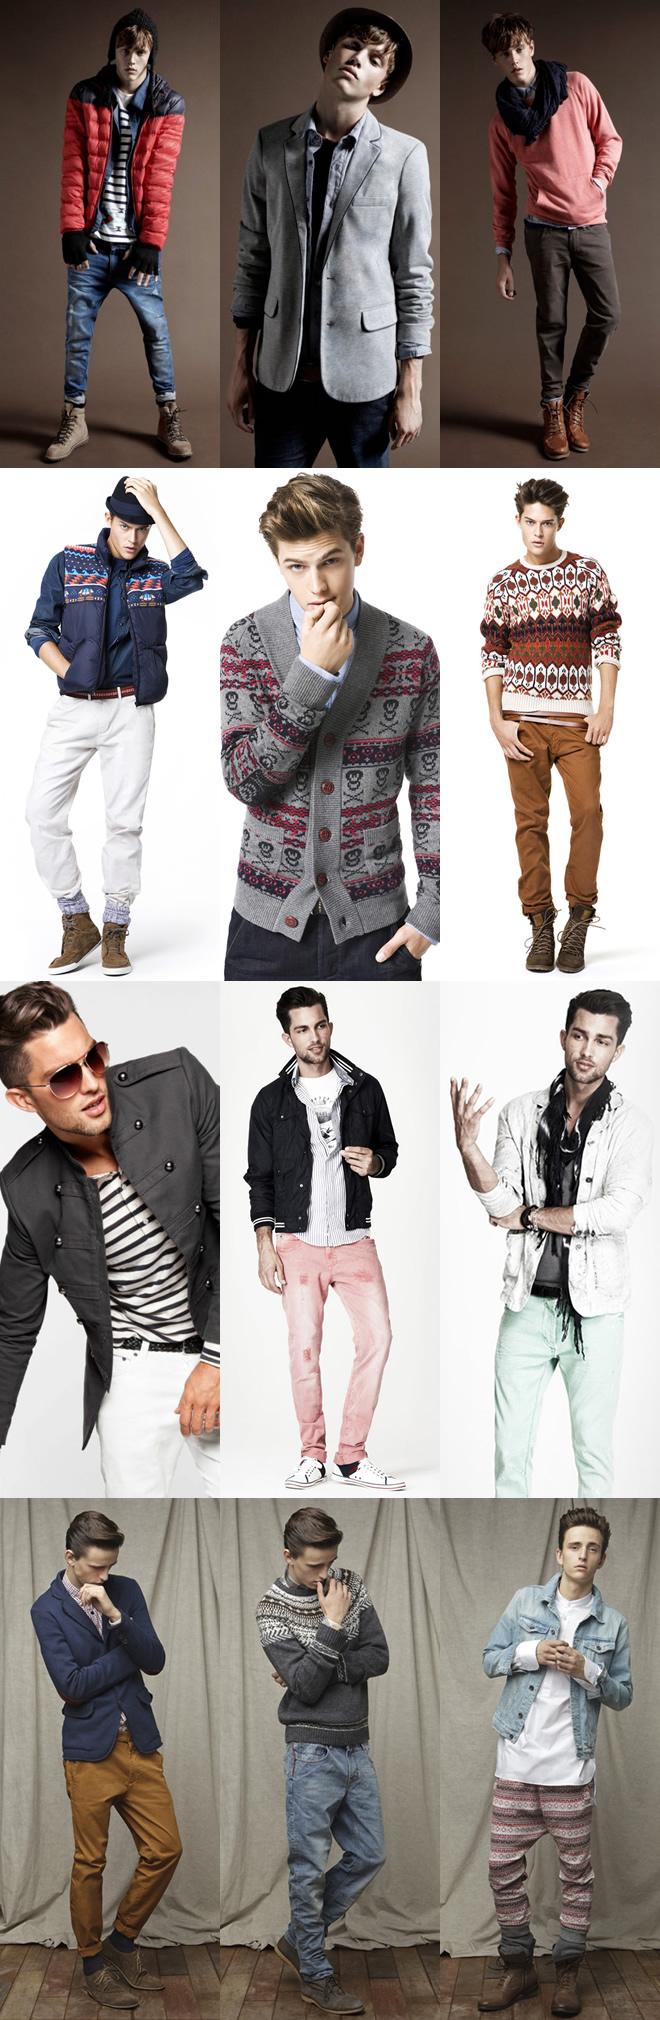 Dressing Your Age Twenties 20 S Via Fashionbeans Com Sick Men S